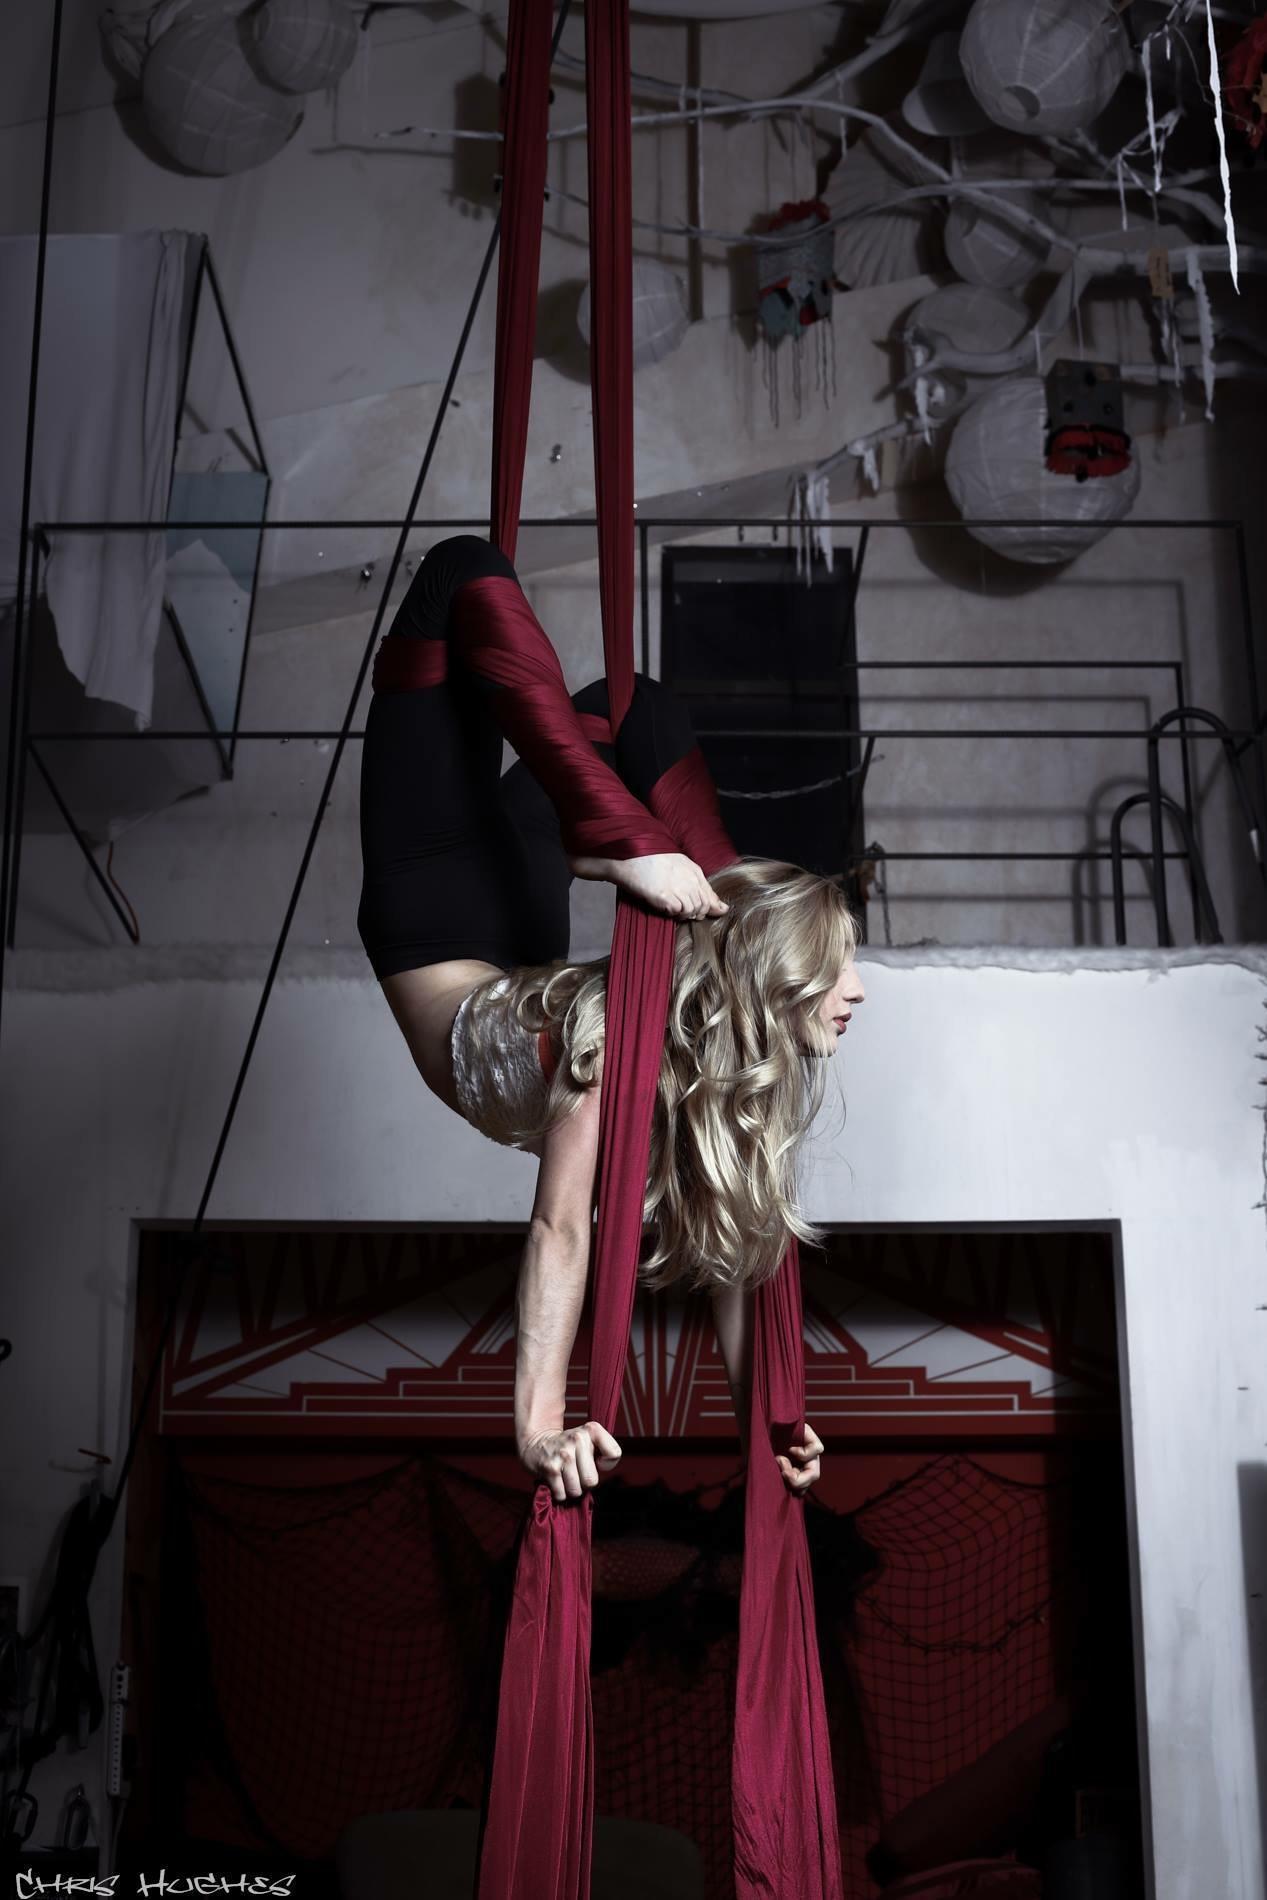 Katelyn Carano aerial silks